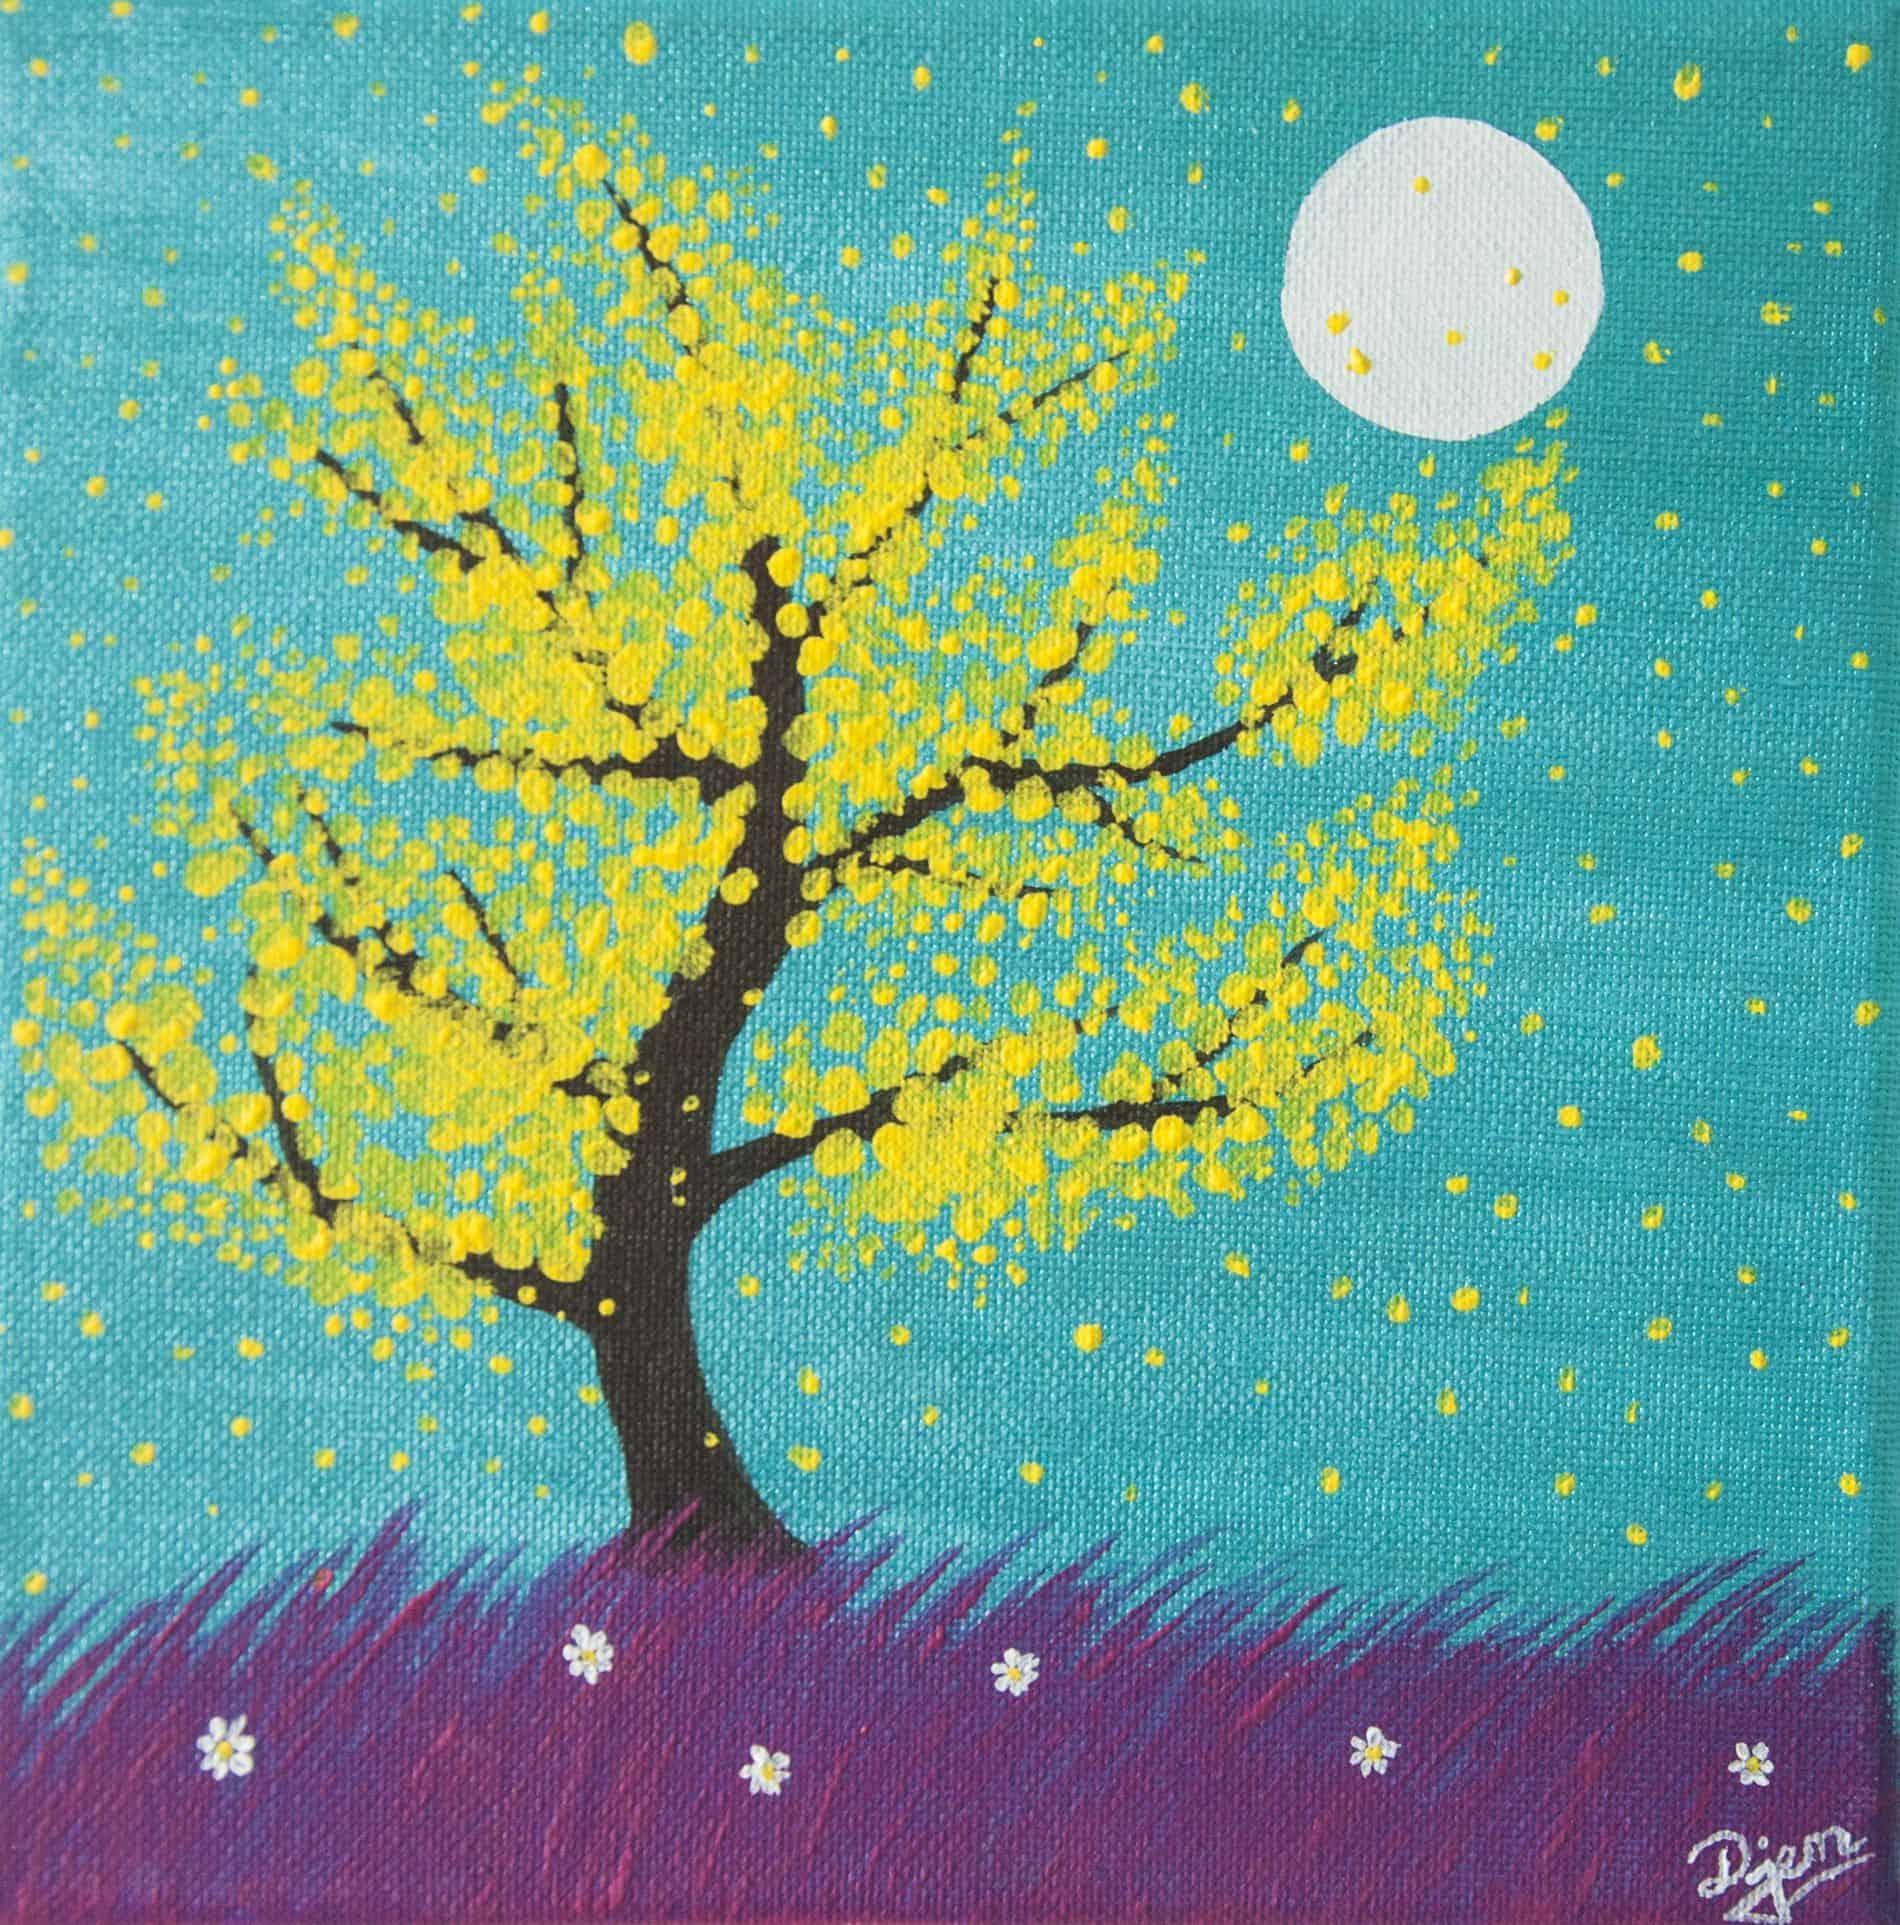 vinella soobrayen_yellowtree